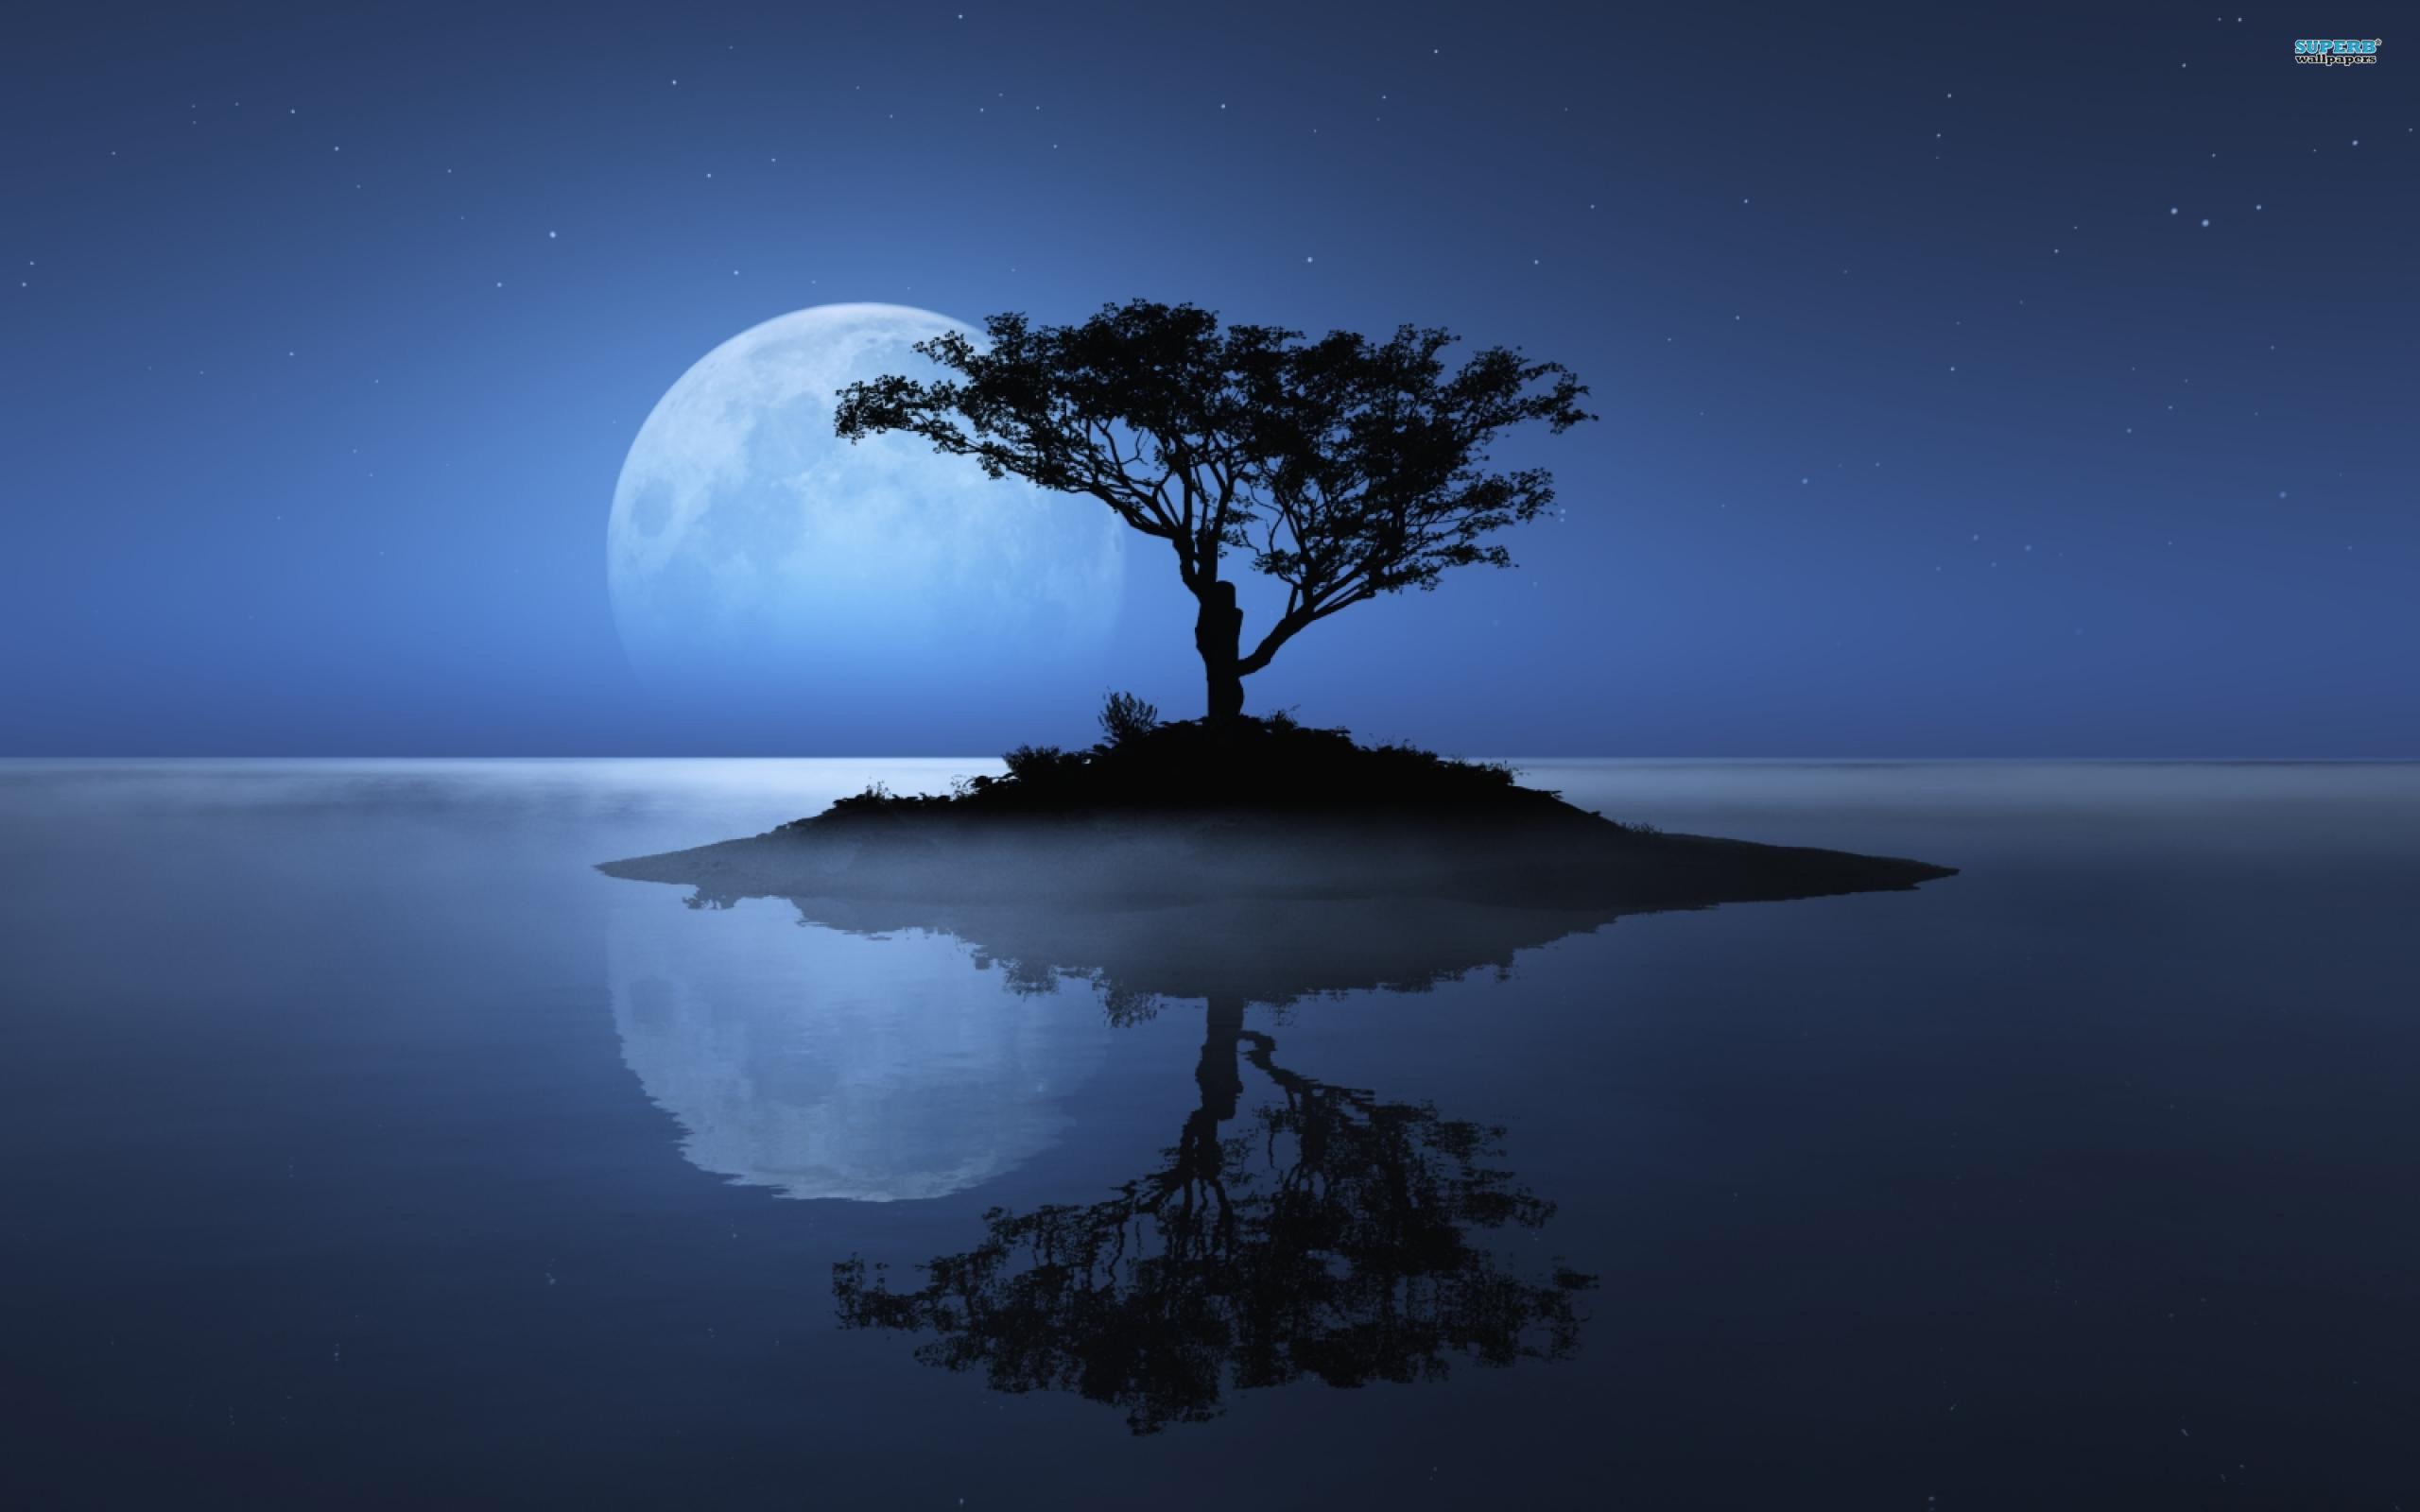 Small Island Sky Moon Wallpaper Hd - Tree And Moon Background , HD Wallpaper & Backgrounds